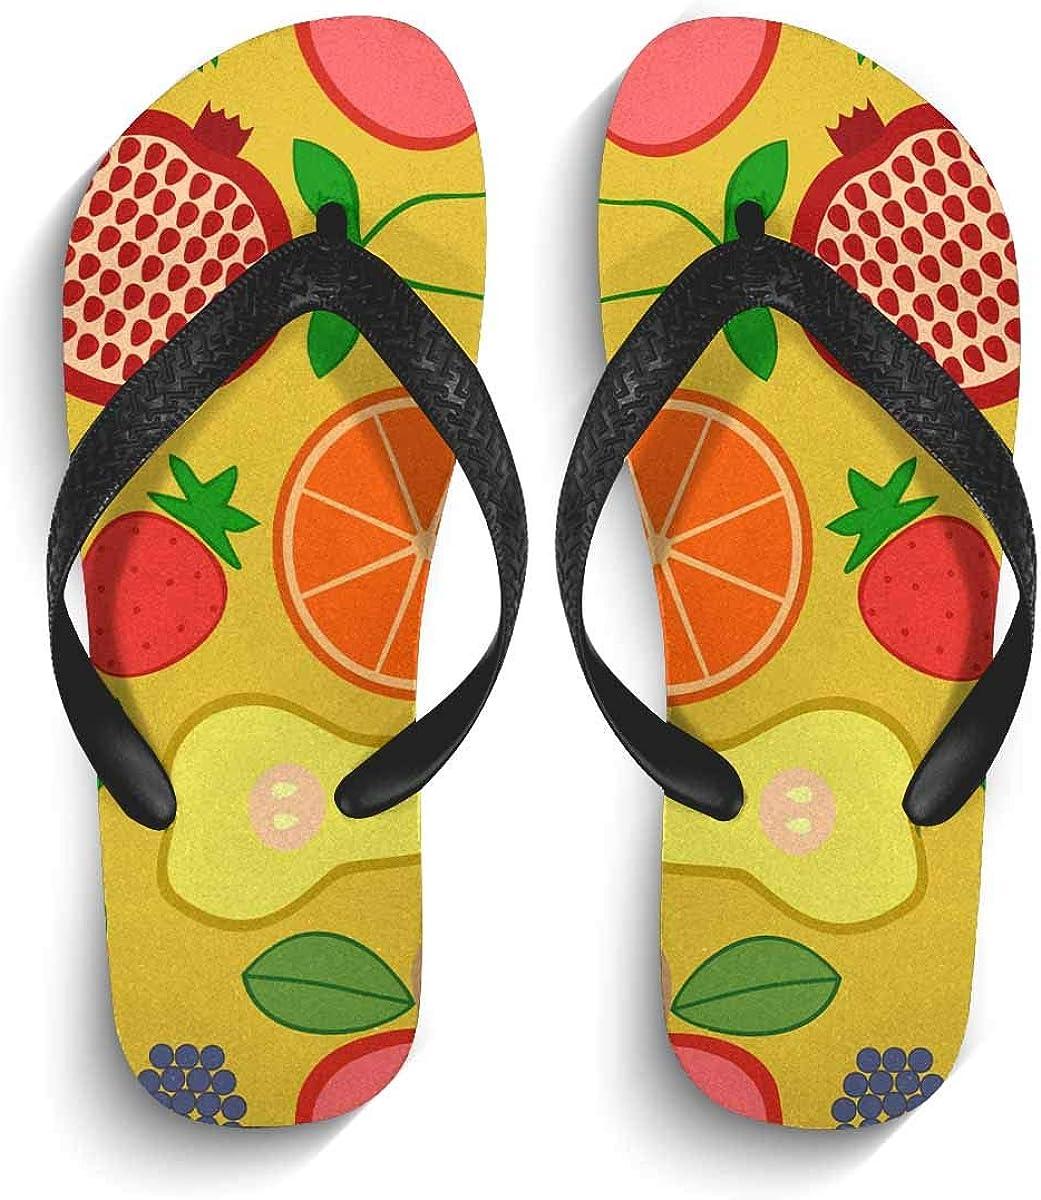 InterestPrint Men's Non-Slip Flip Flops Sandal Fruits and Berries on Yellow Background Summer Beach Thong Slippers XL